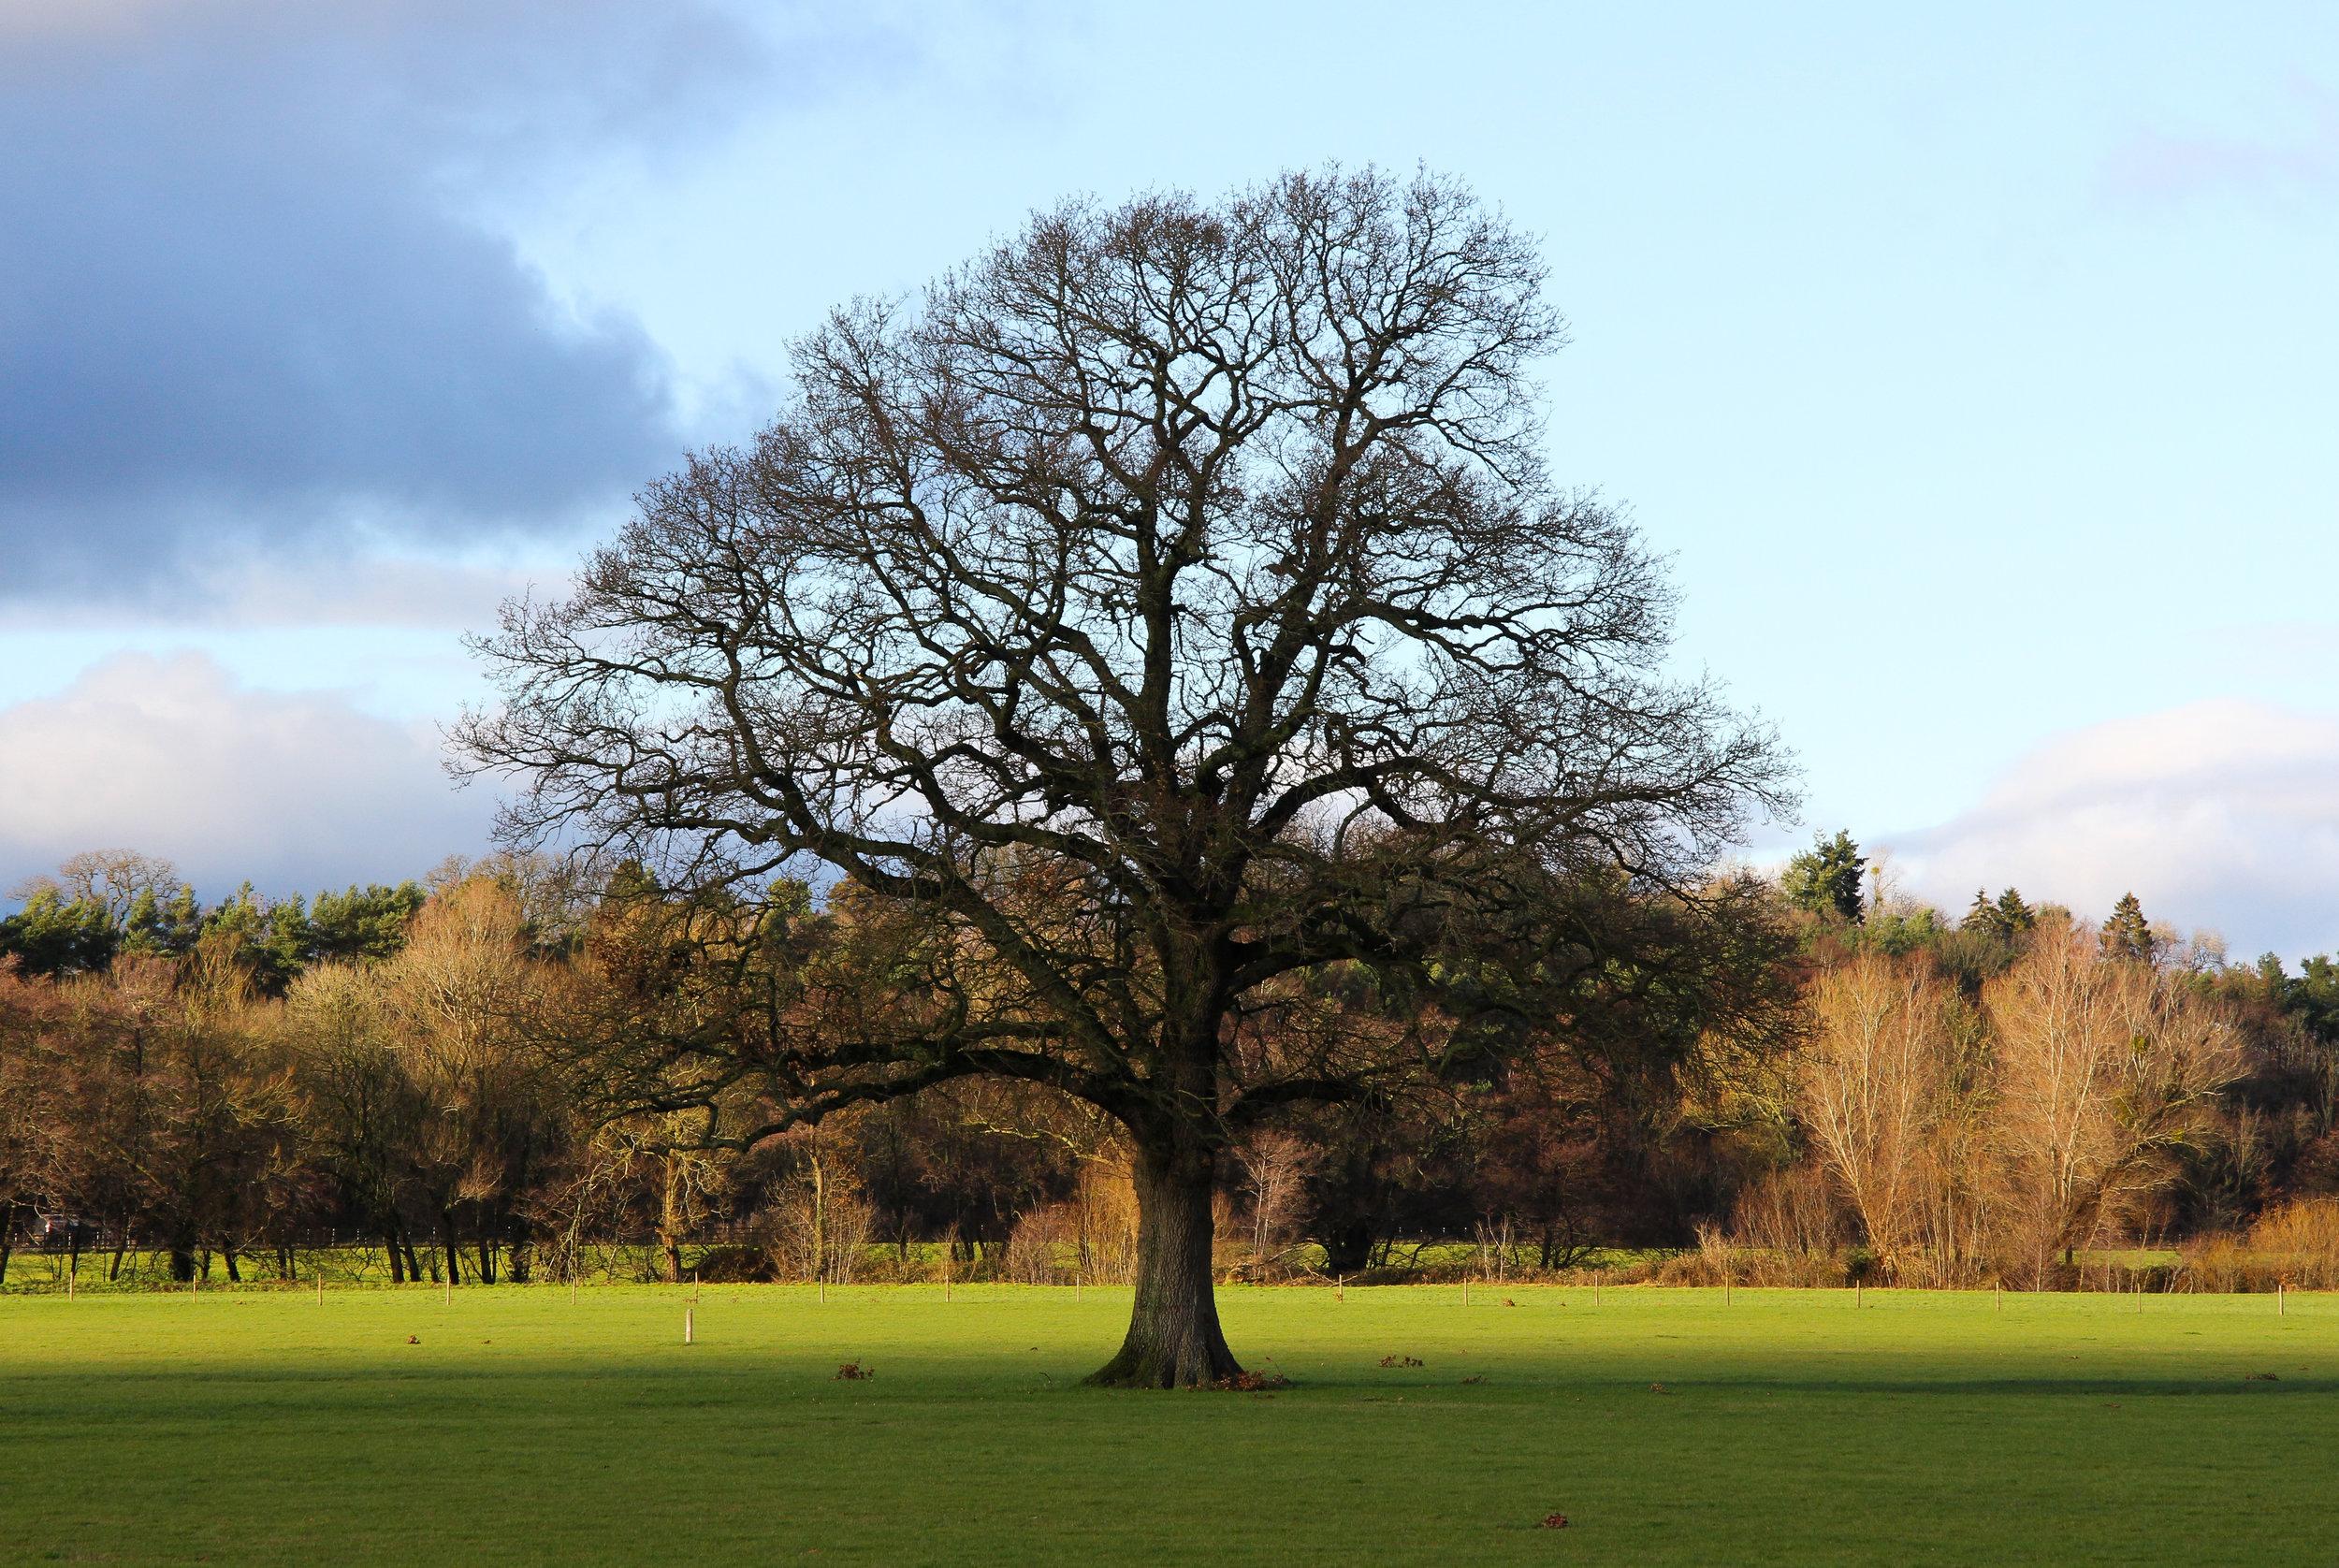 Tree at Usk Showground, Wales.